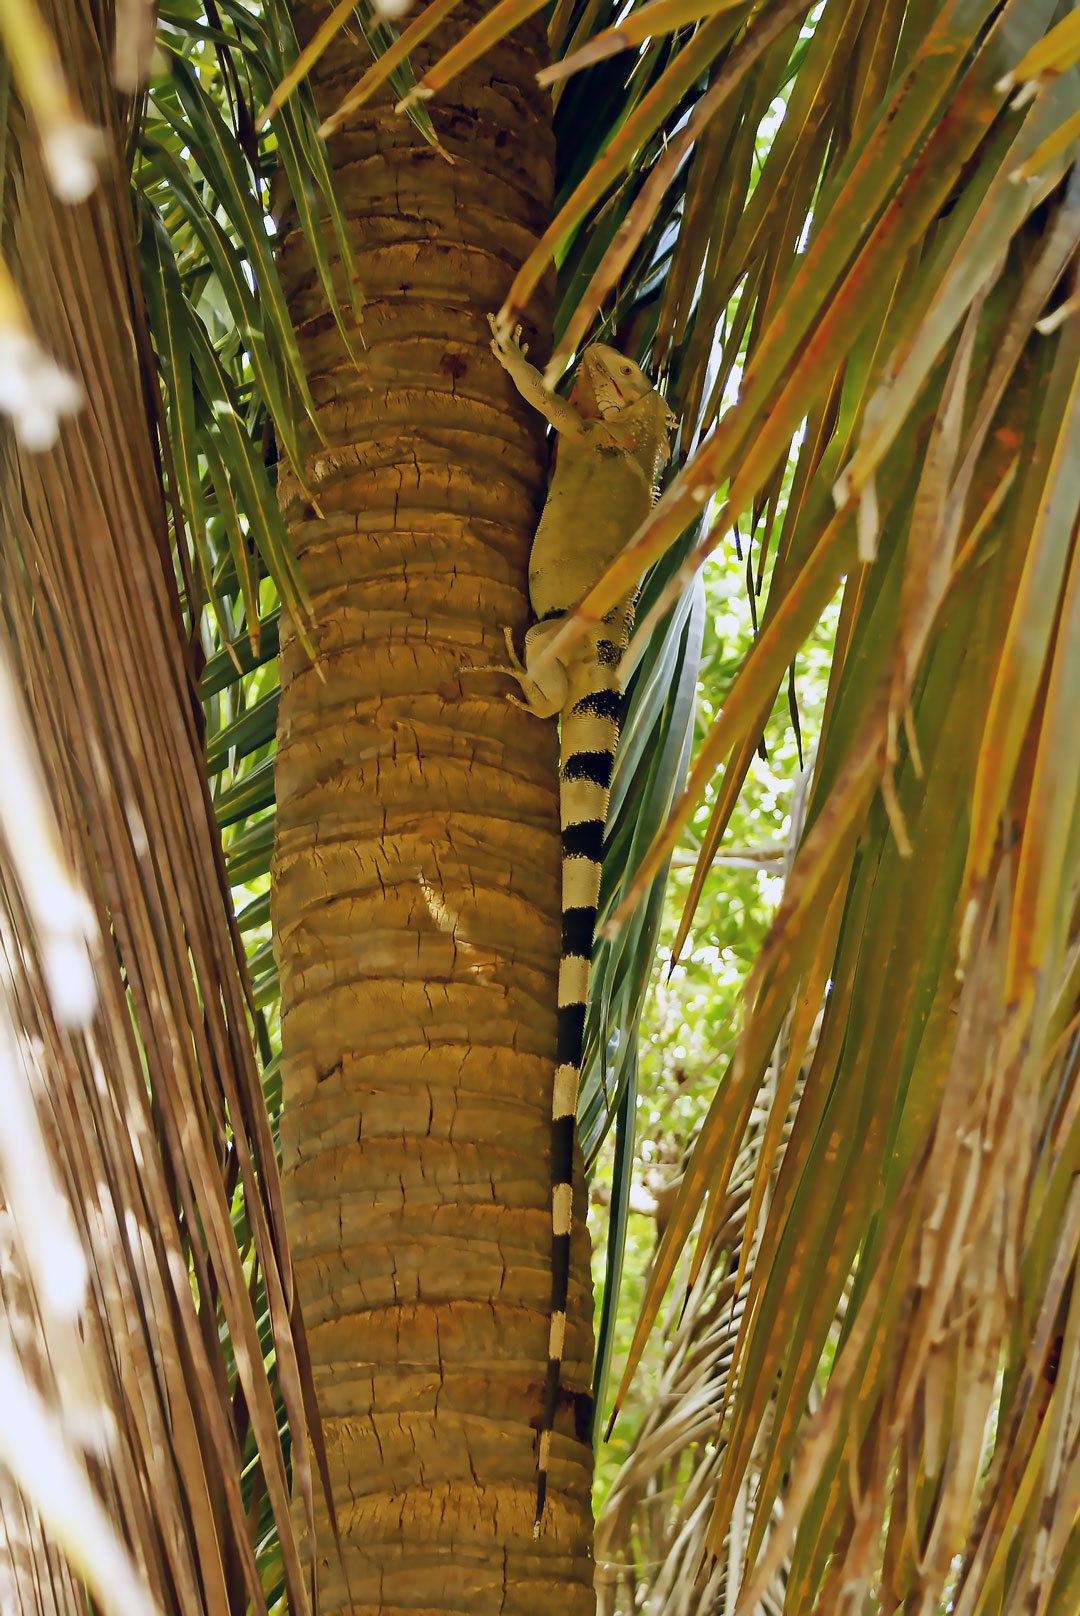 The iguana returning home after lunch. Photo by Ovidiu Balaj